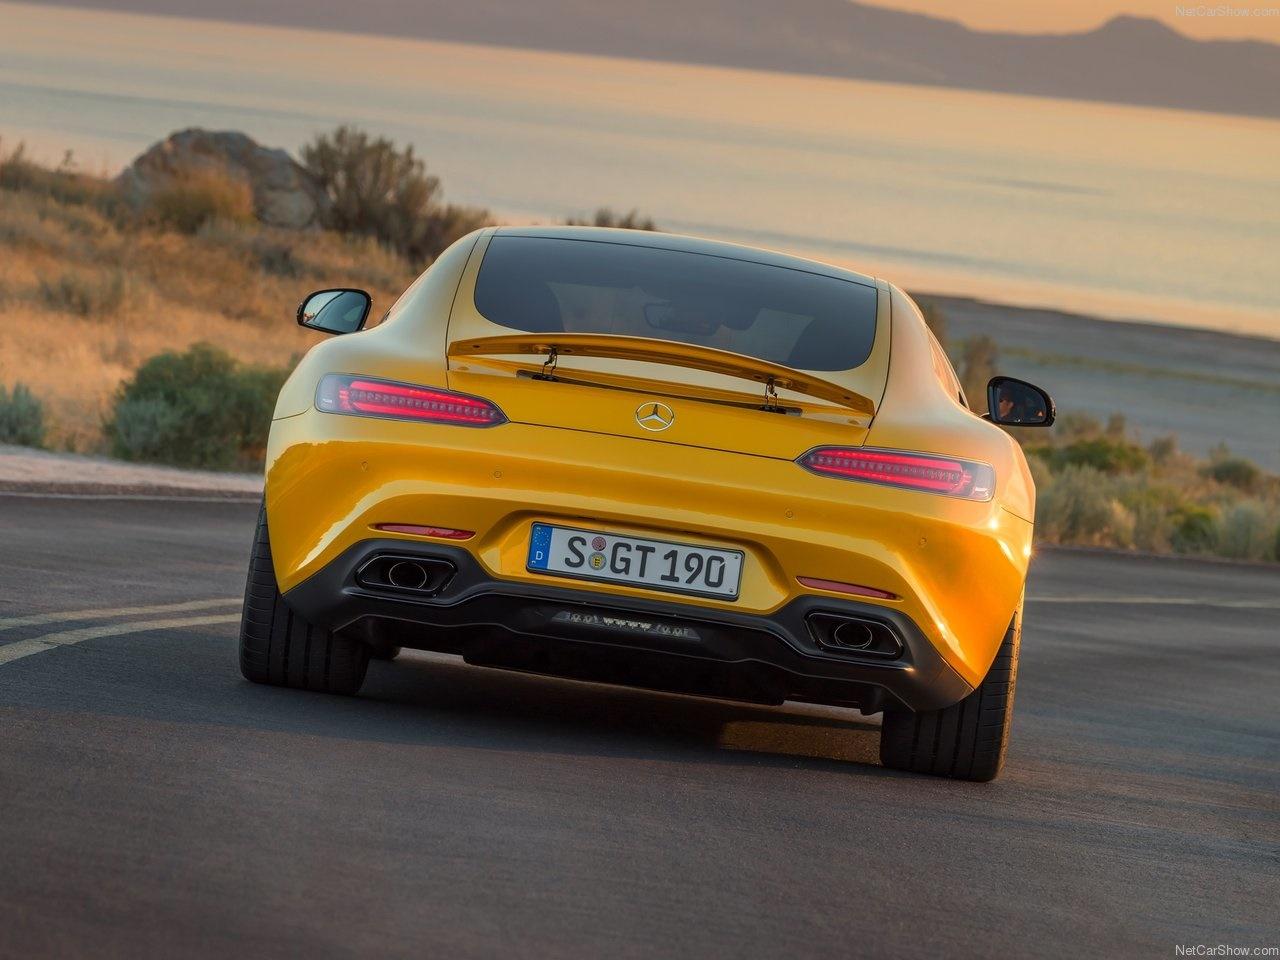 مشخصات AMG GT مرسدس بنز جی تی قیمت AMG GT MERCEDES AMG GT